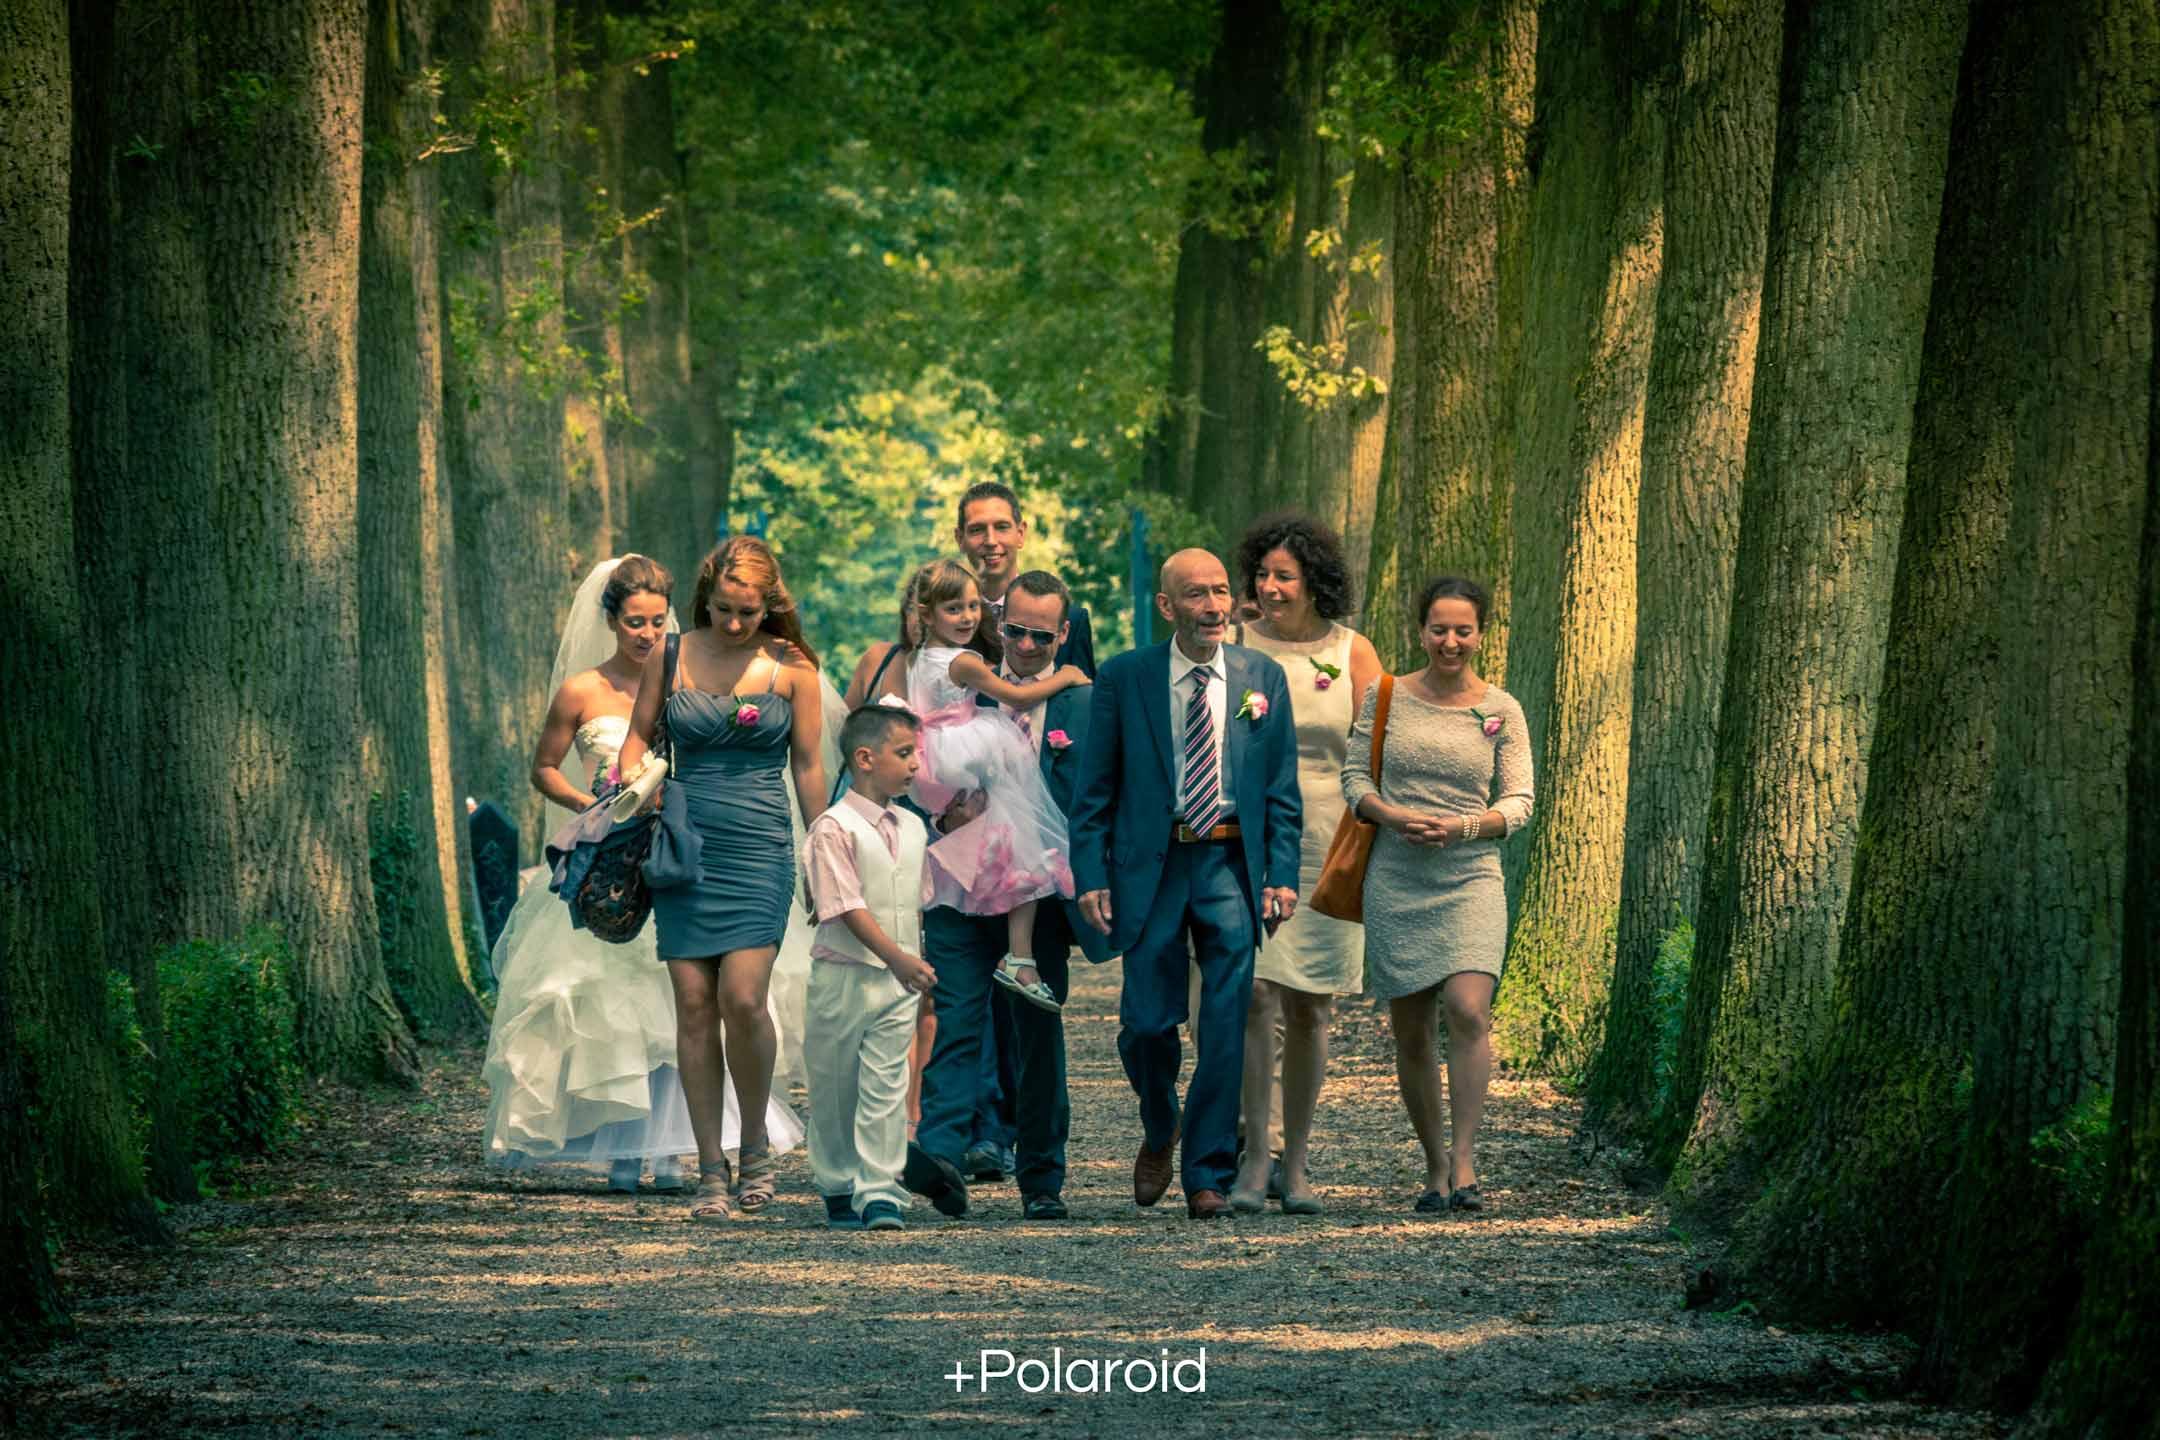 +Polaroid.jpg